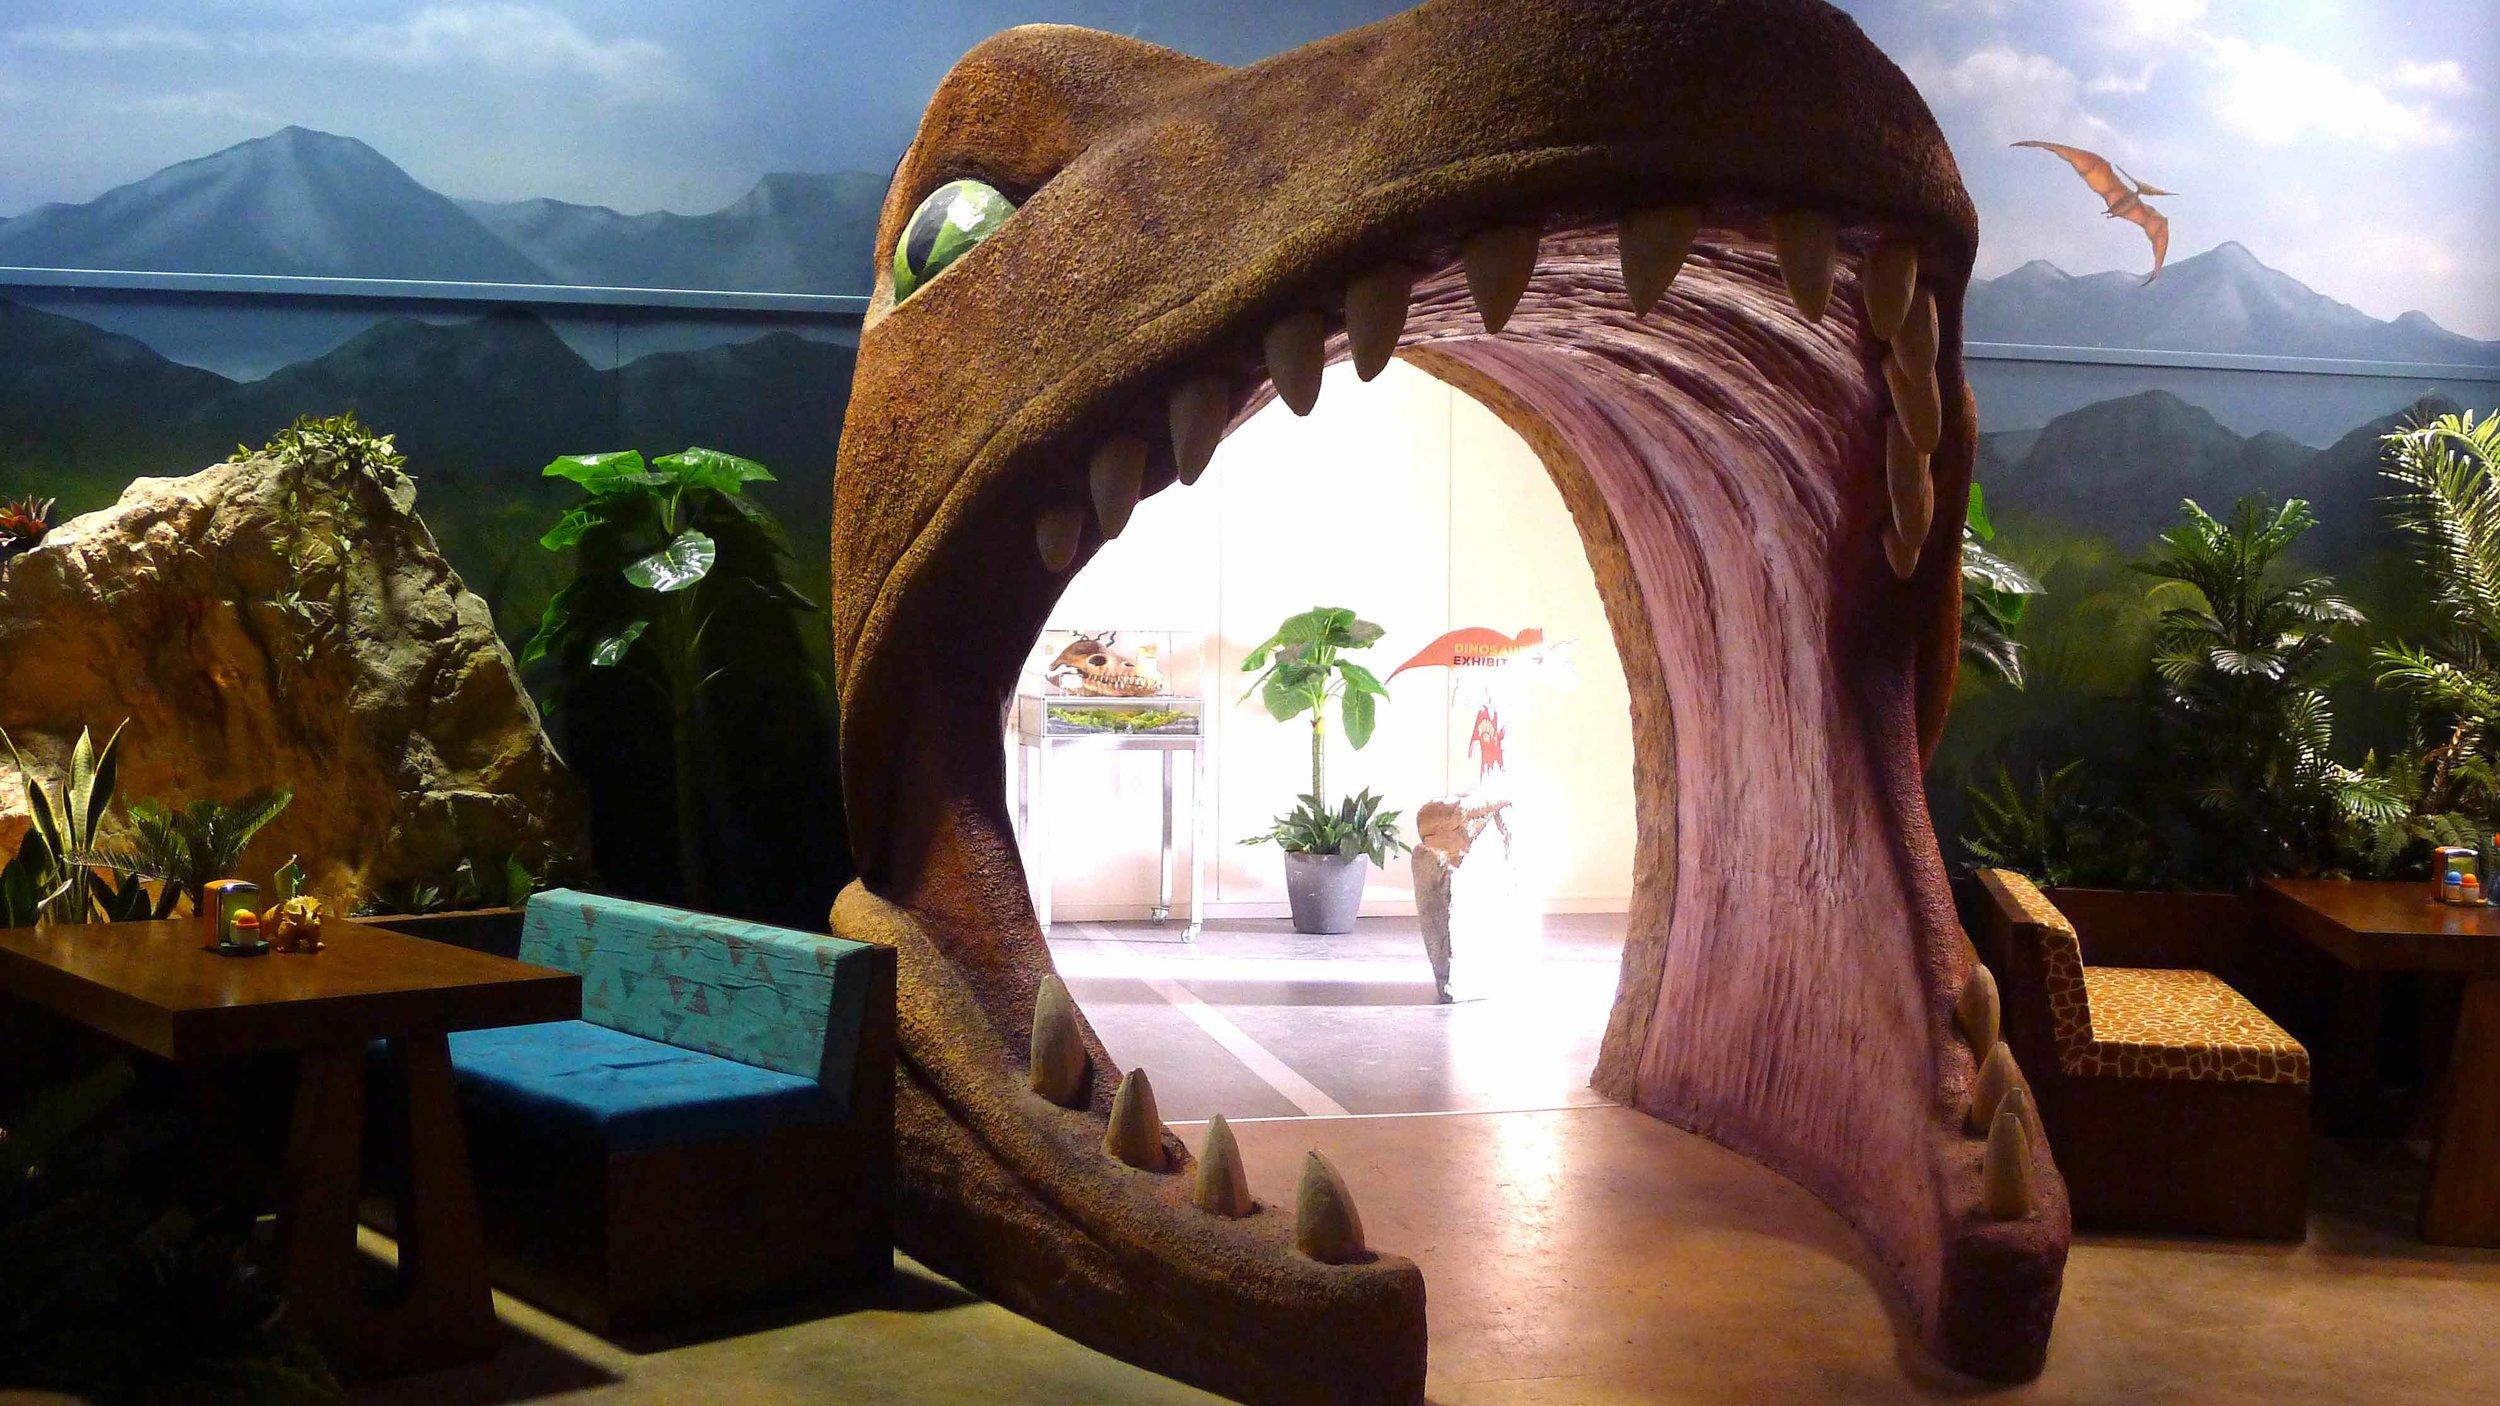 Dino Bite Cafe entrance - Set image